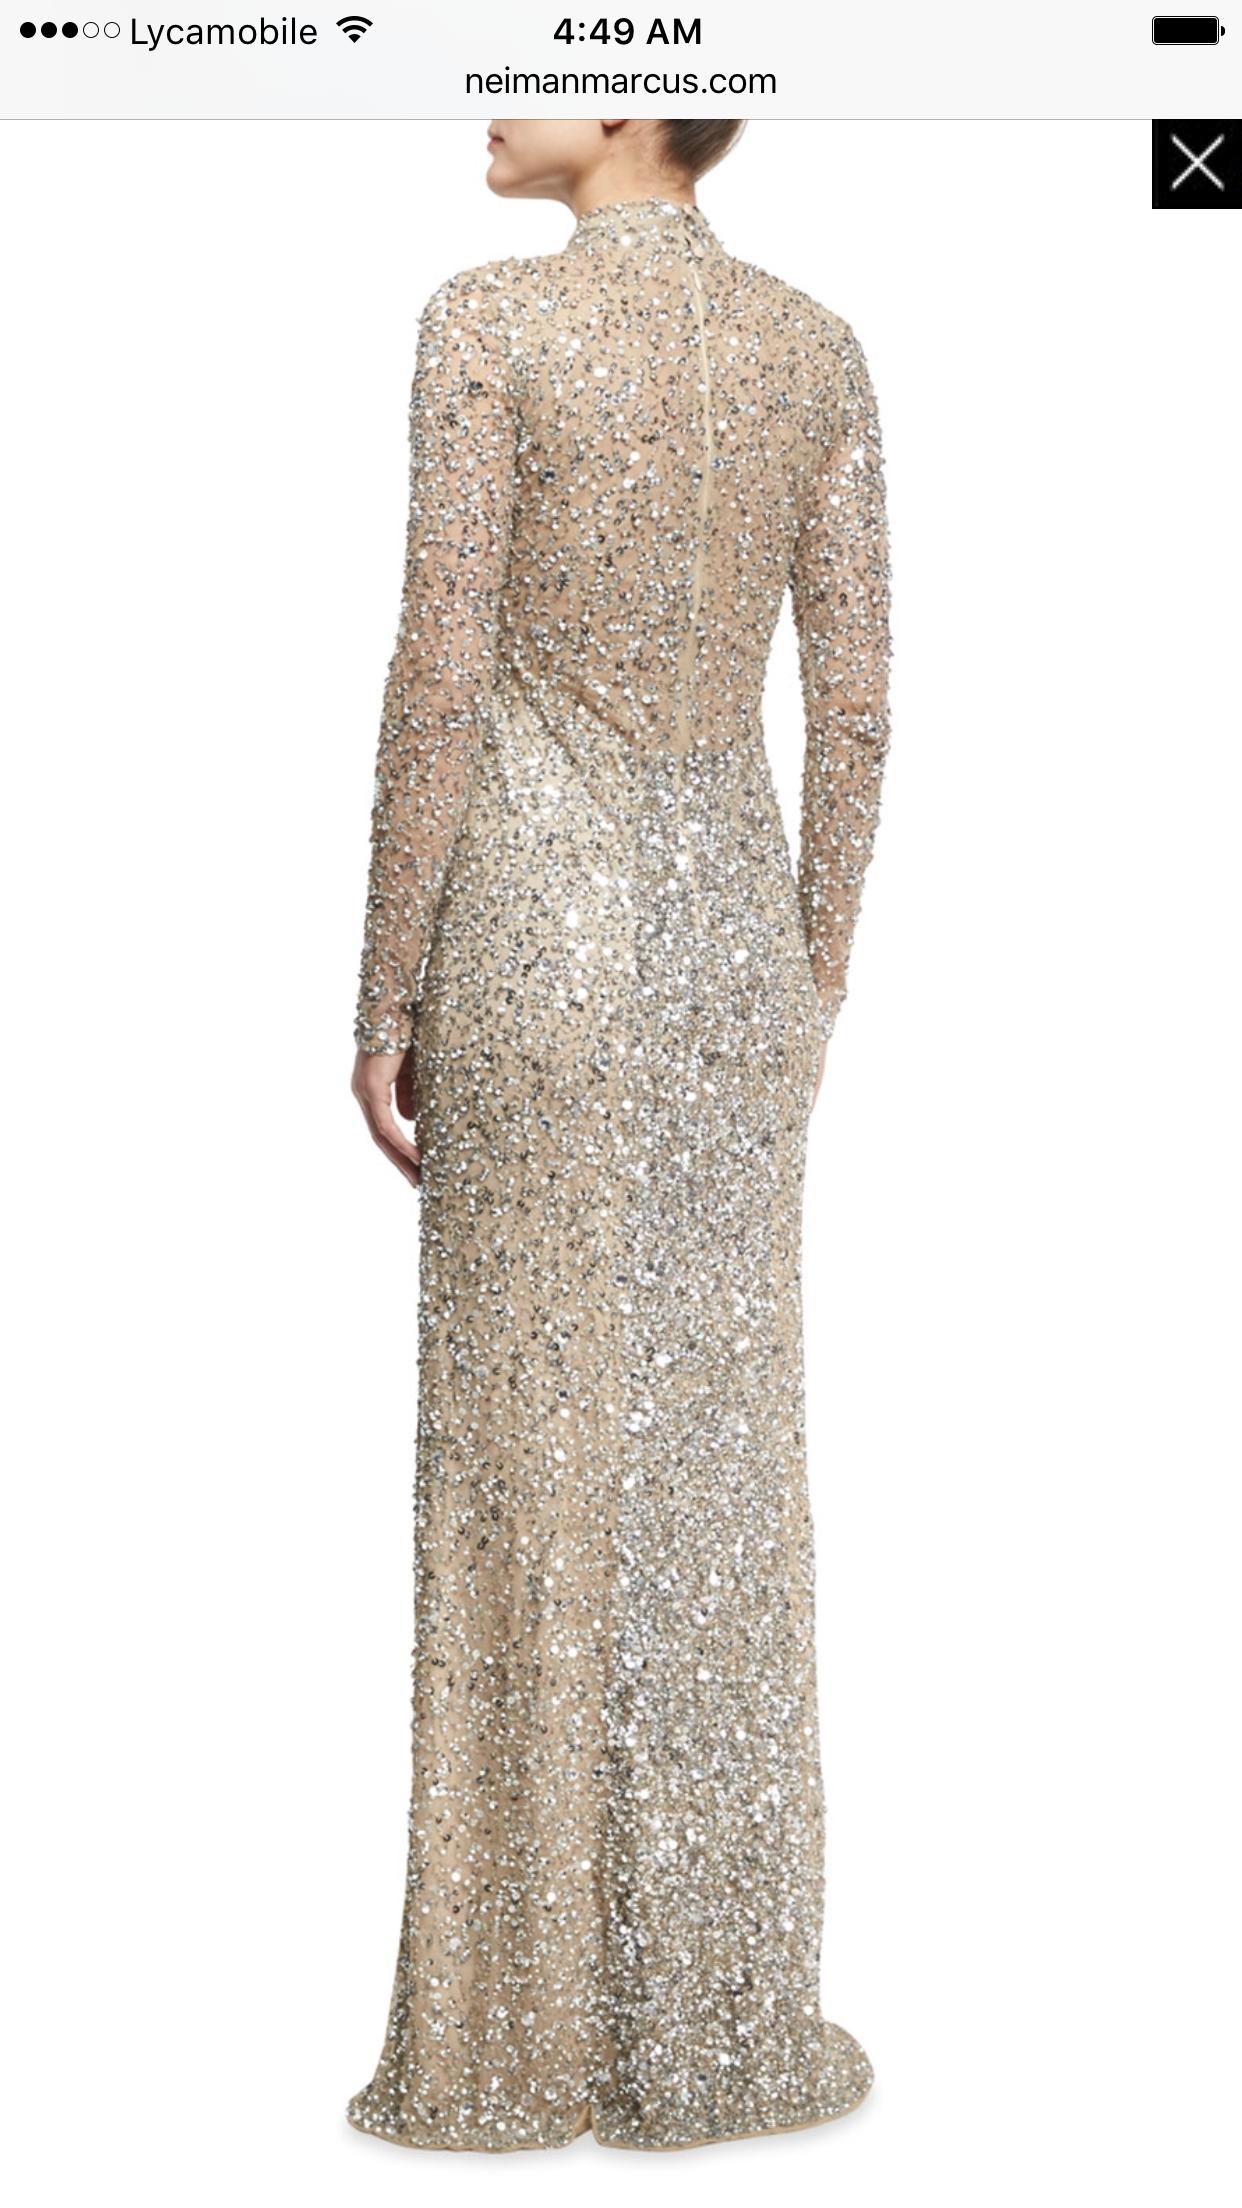 Pin by thaira kartoum on Evening dresses | Pinterest